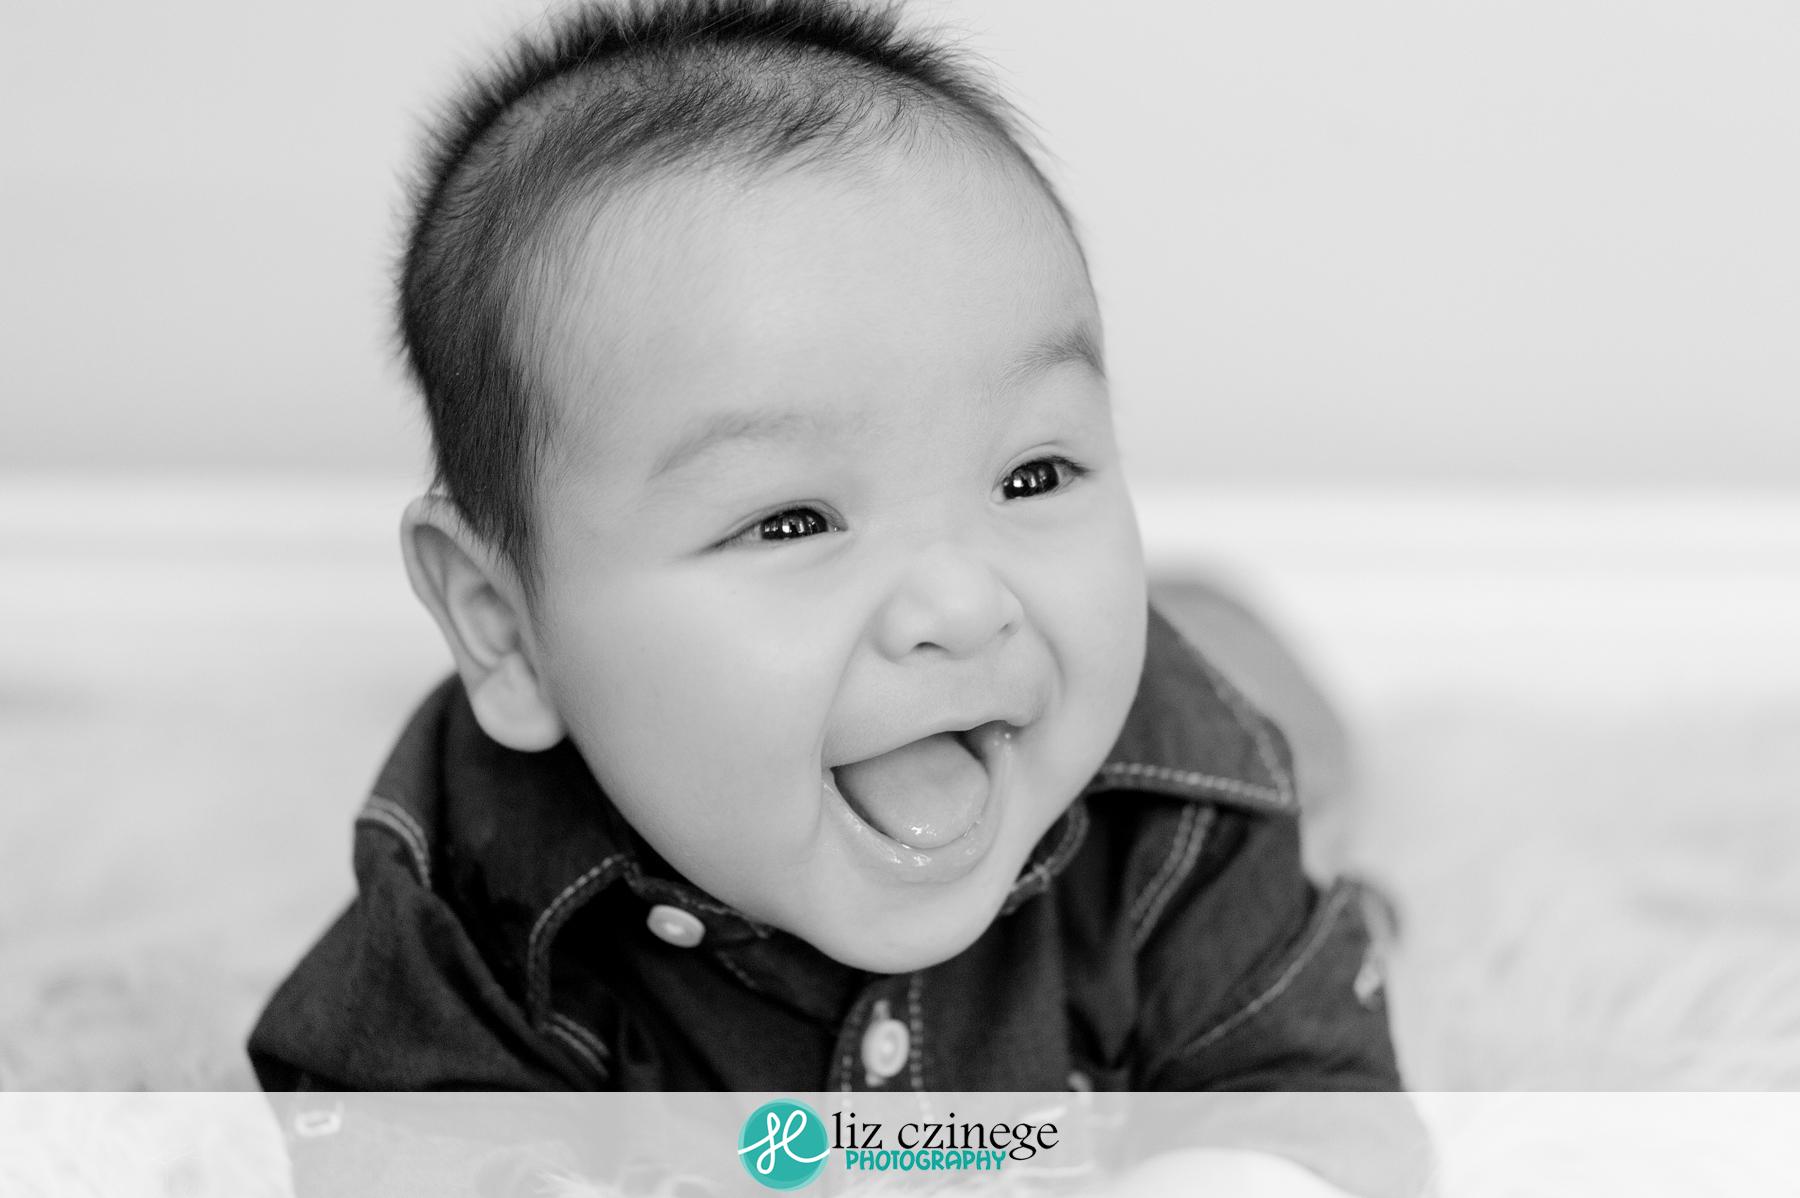 czinege-photography-niagara-child-02